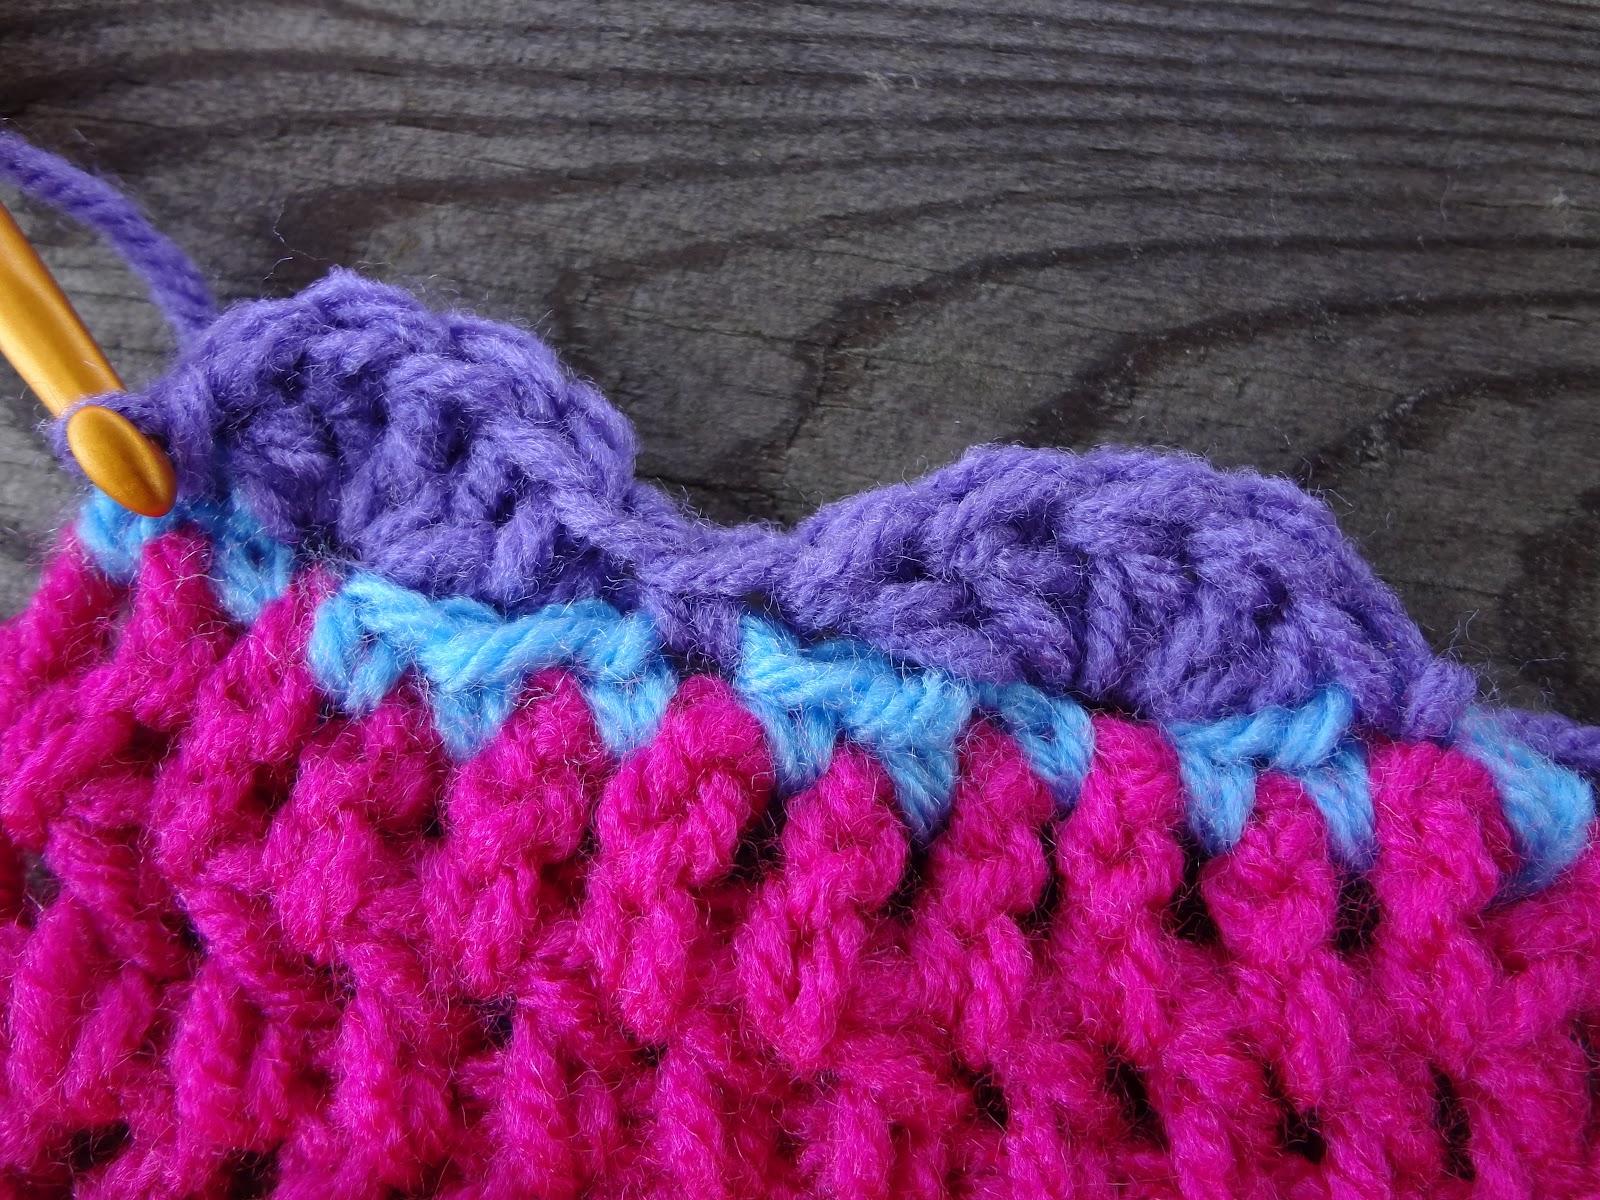 Fiber flux how to crochet scallop edging how to crochet scallop edging bankloansurffo Images